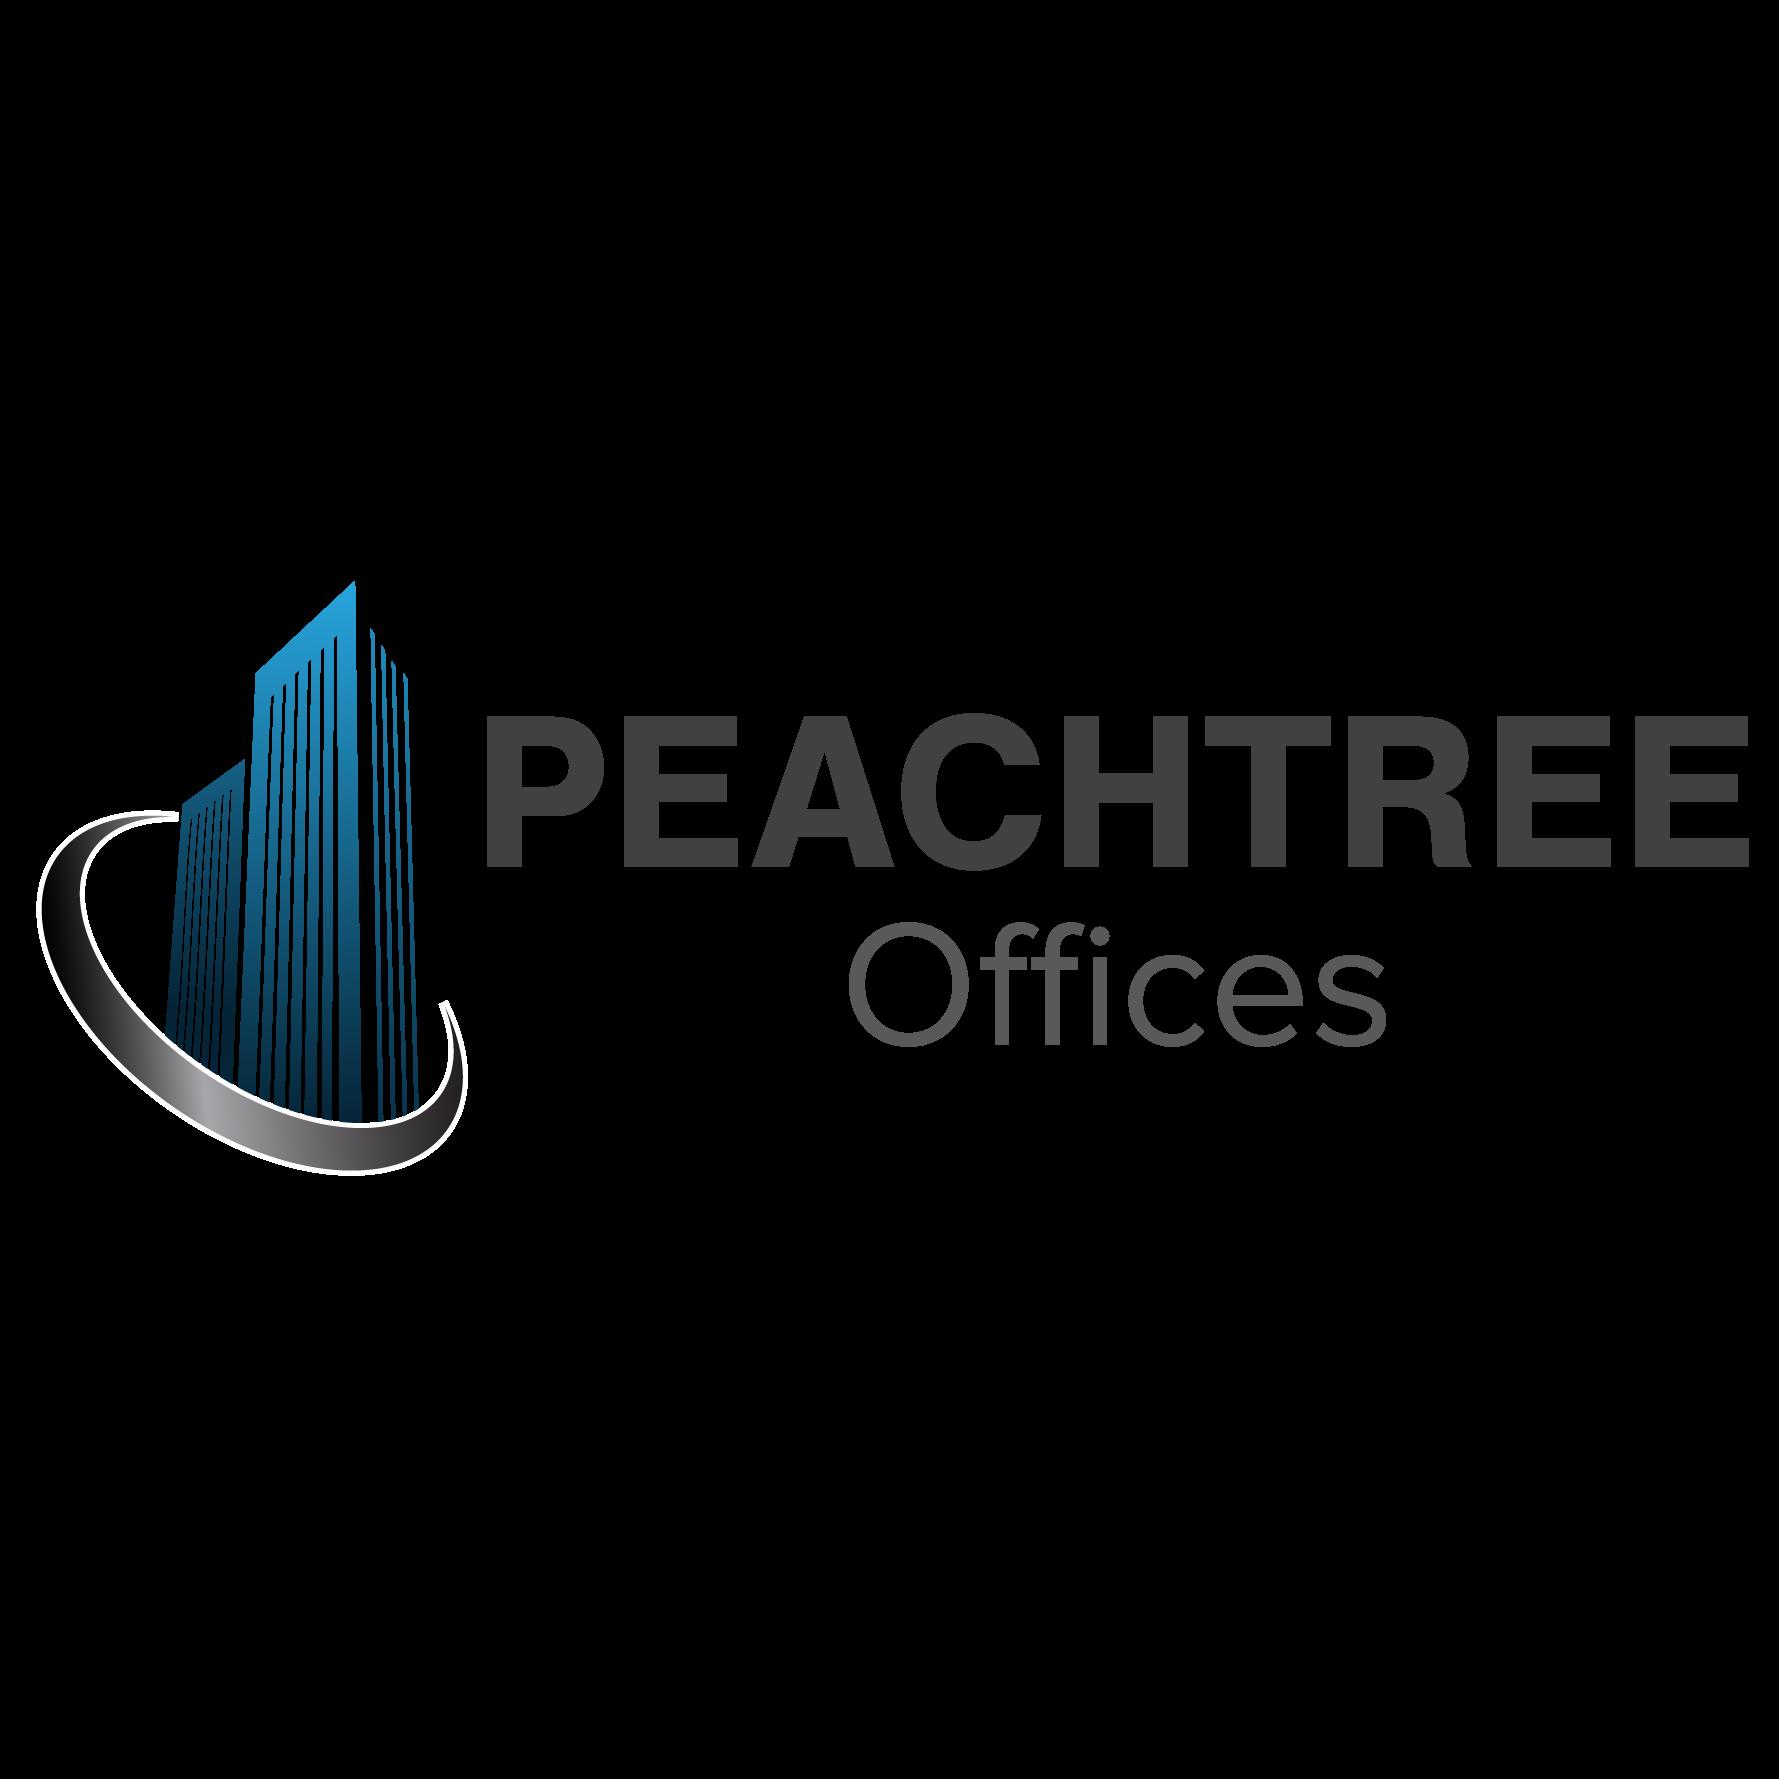 Peachtree offices atlanta georgia ga for Peachree